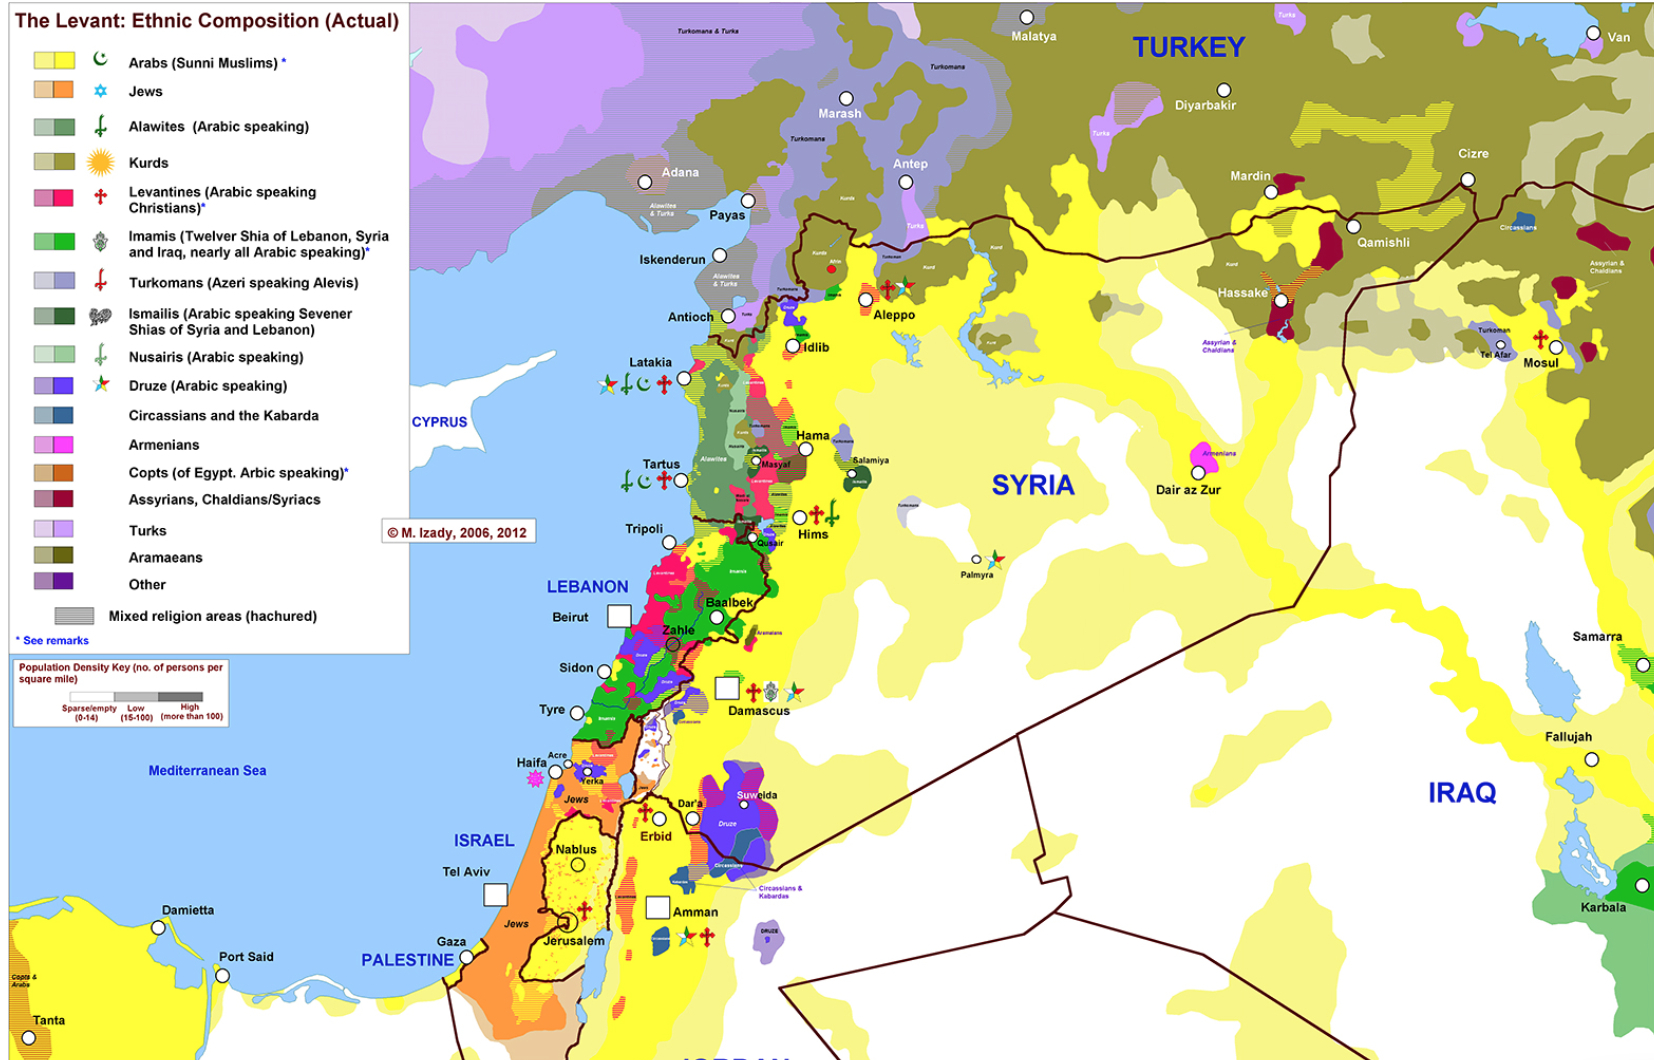 Levant Region Map Levant Map of Ethnicities